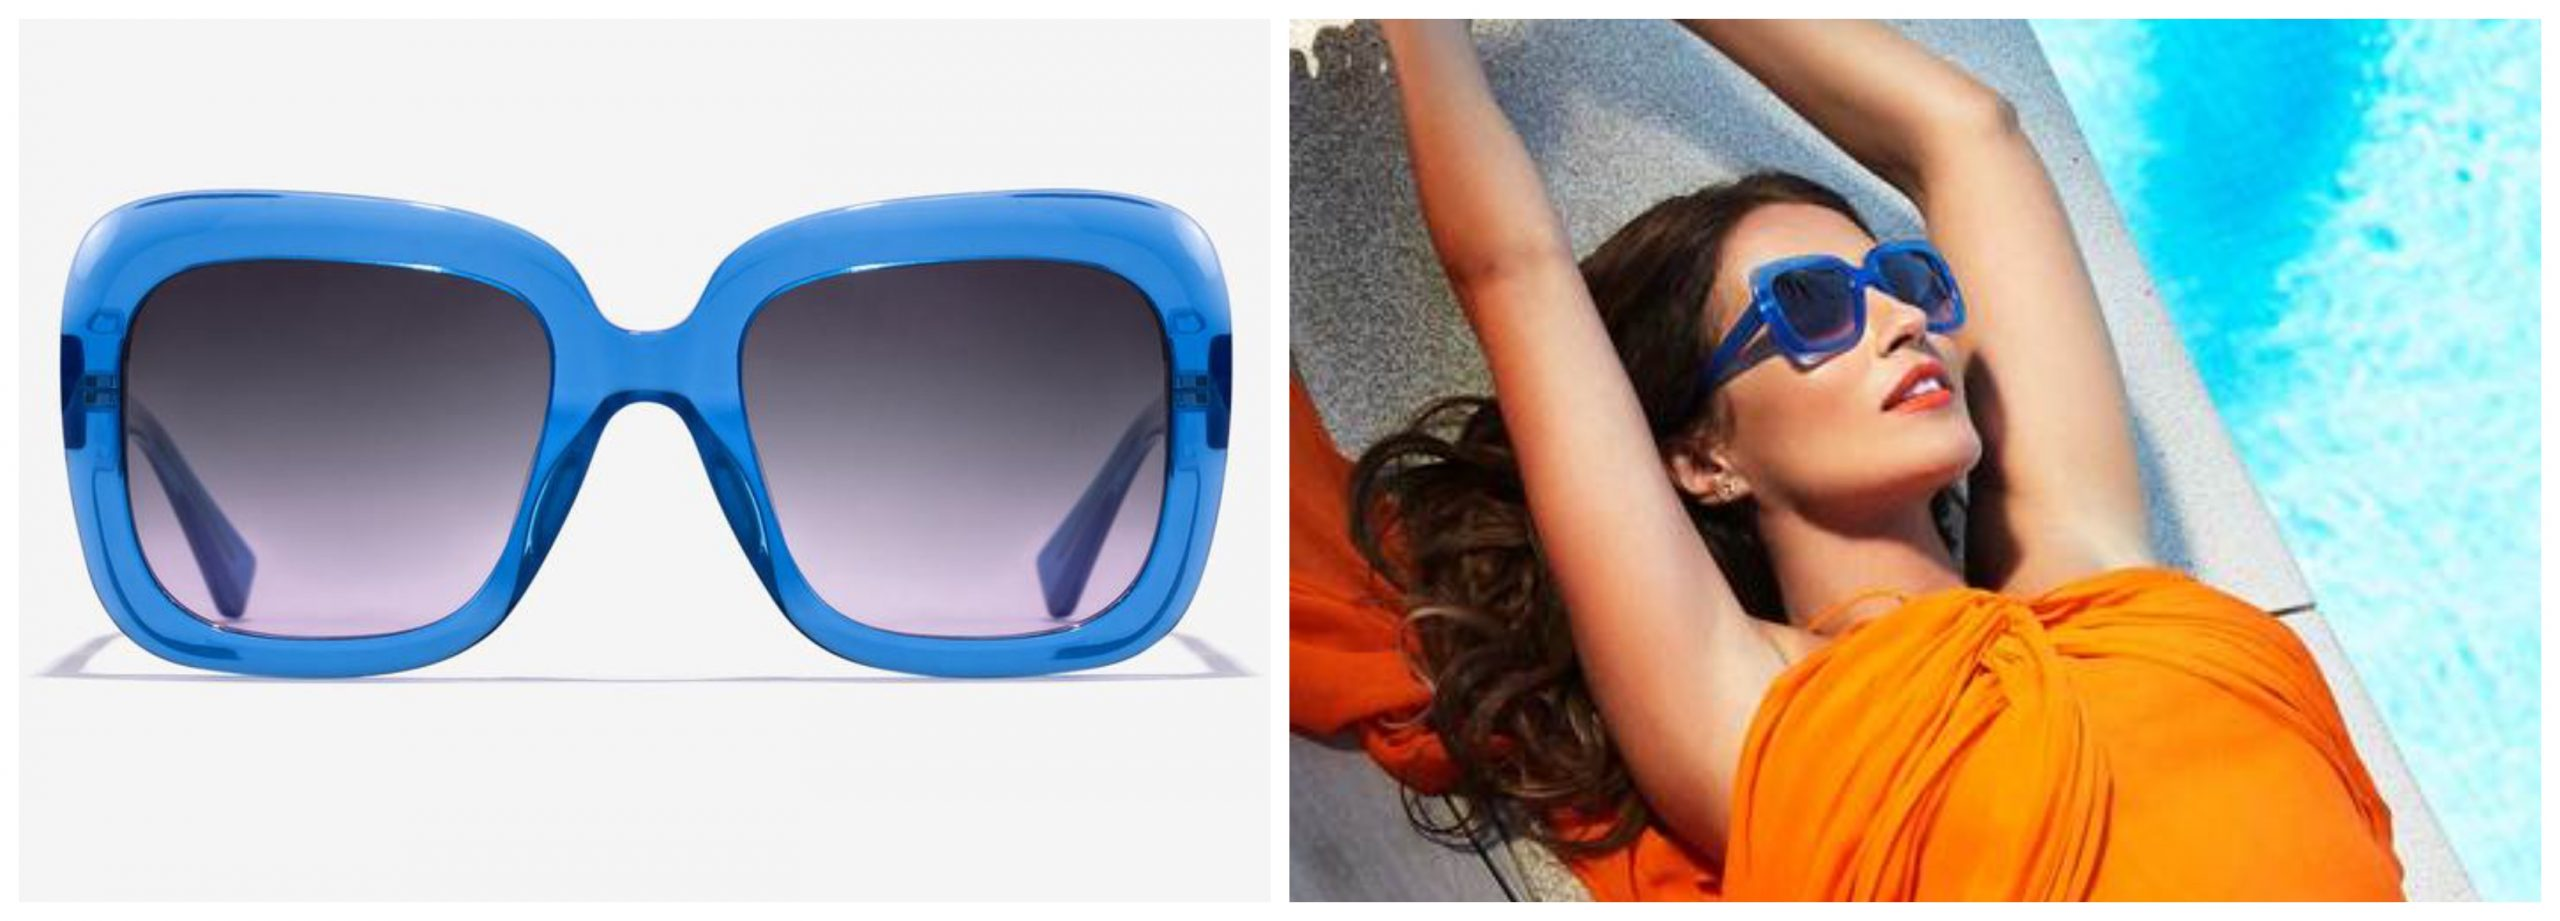 Gafas xxl azules de Hawkers.